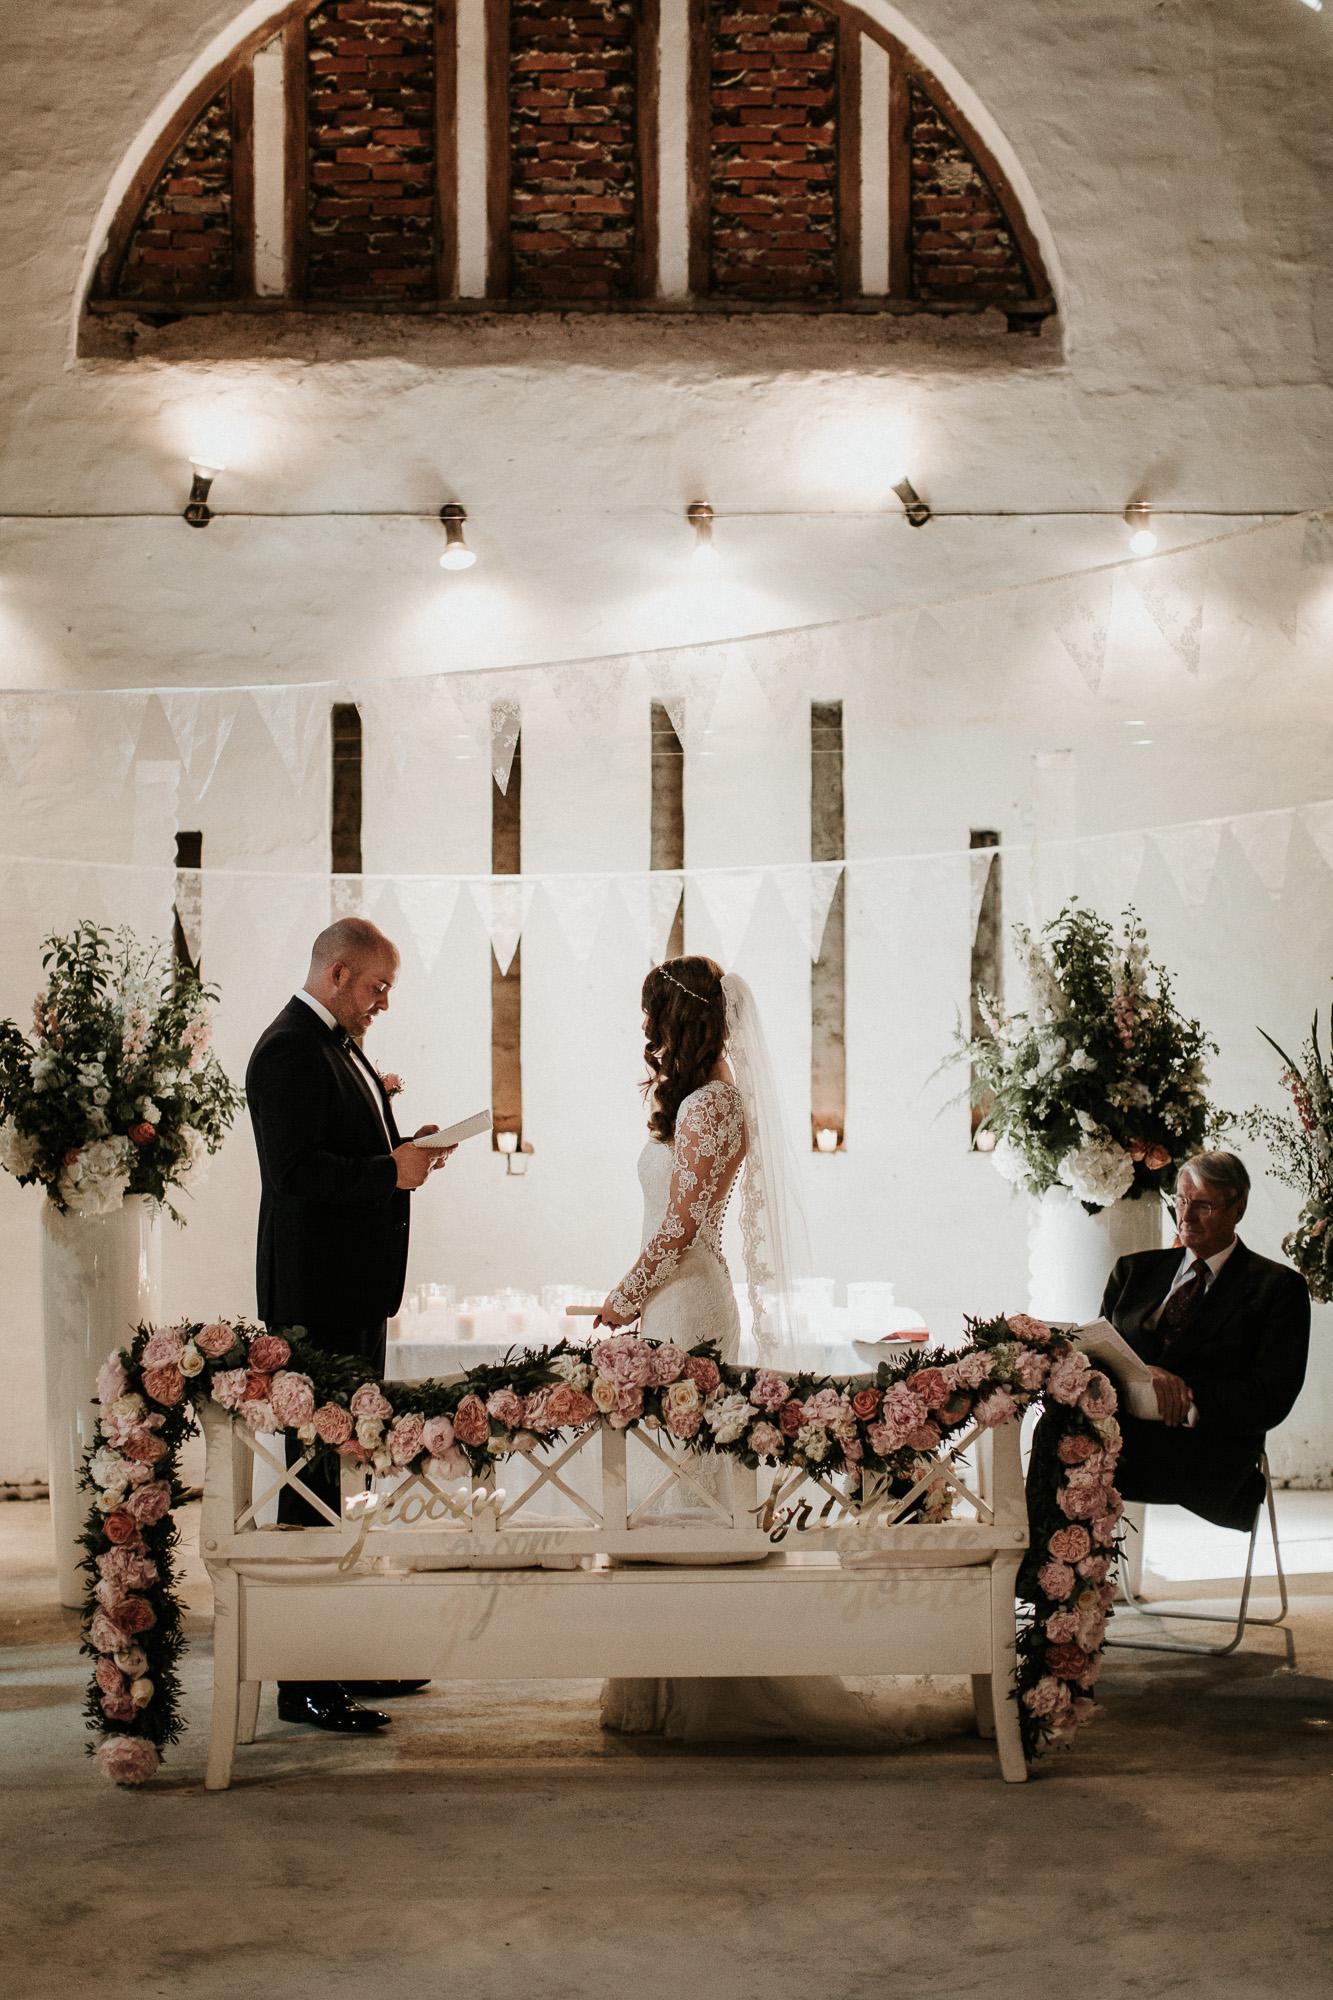 DanielaMarquardtPhotography_Hochzeitsfotograf_Düsseldorf_Köln_Mallorca_Bayern_Austria_Harz_Wedding_AileenundLennart_Weddingphotographer_Ibiza_Tuskany_Italien_Toskana_Portugal_Lissabon134